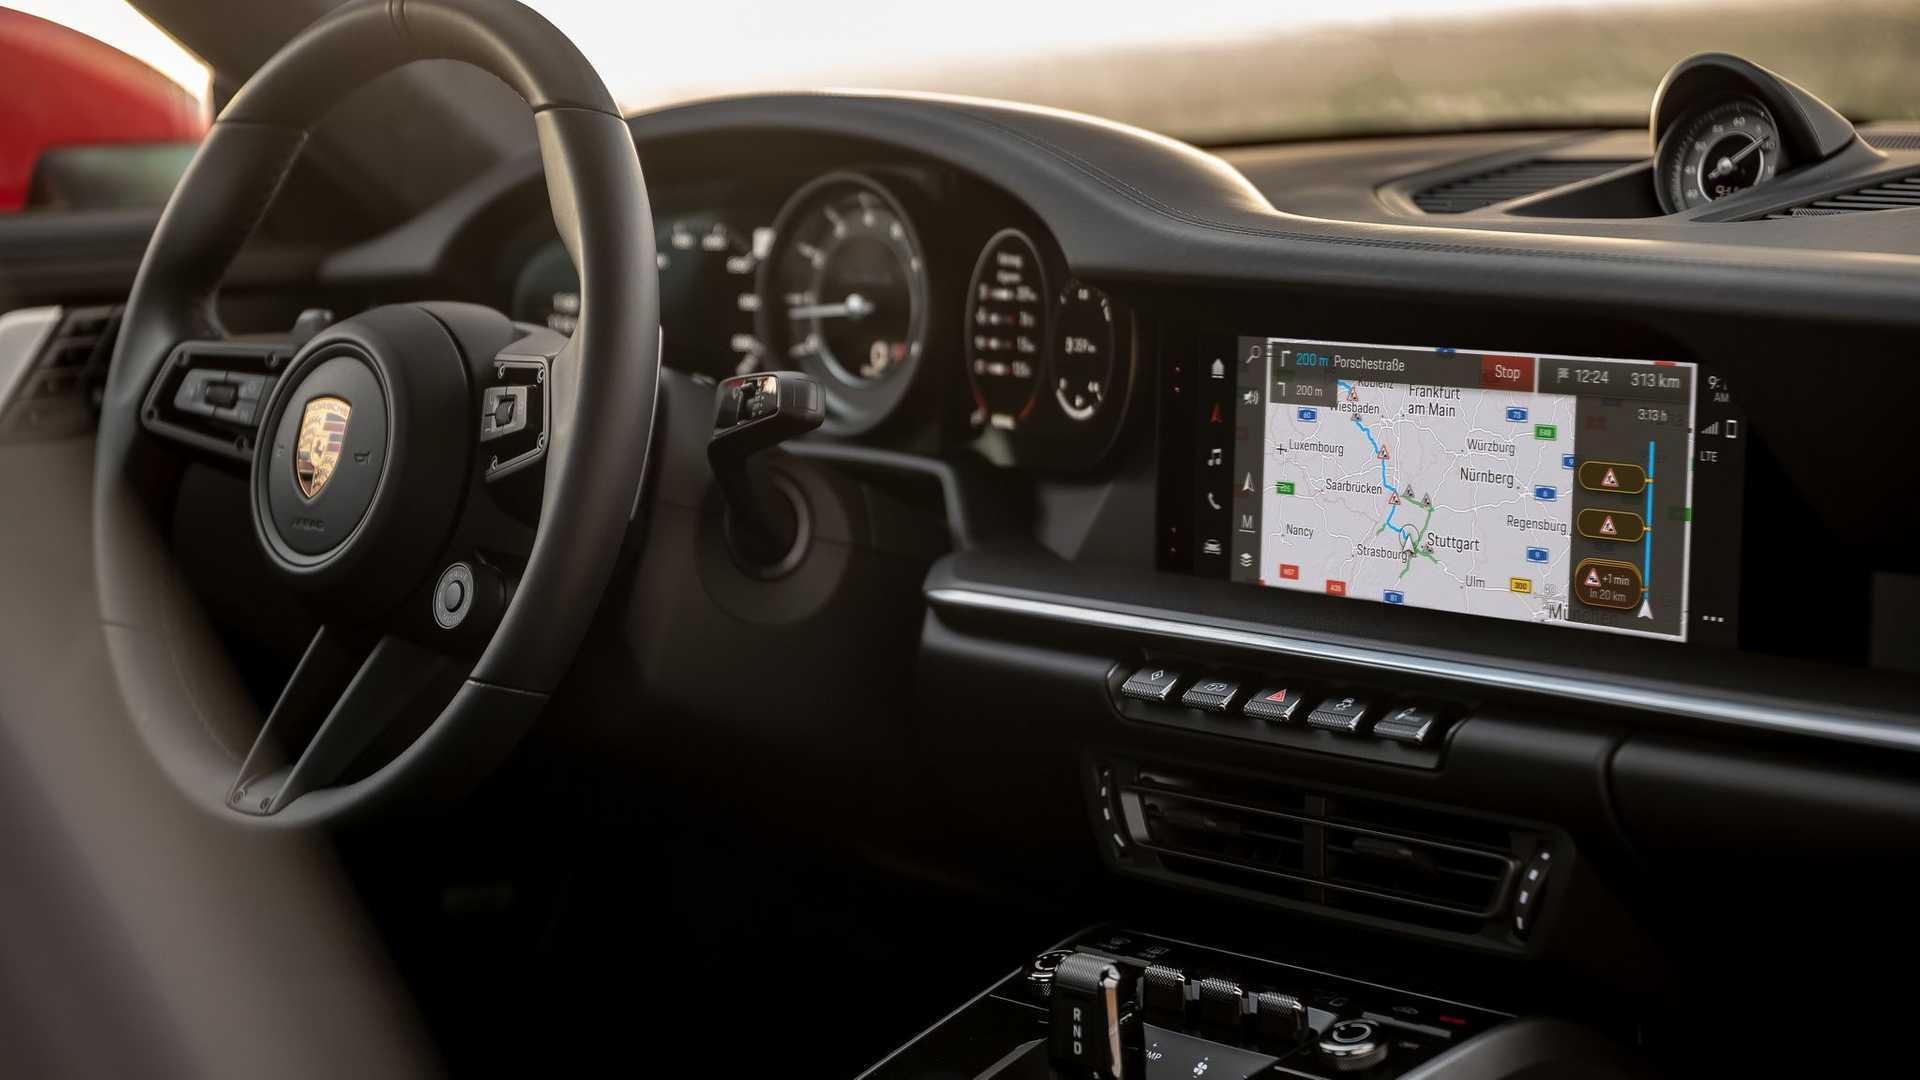 Porsche-Communication-Management-6-11